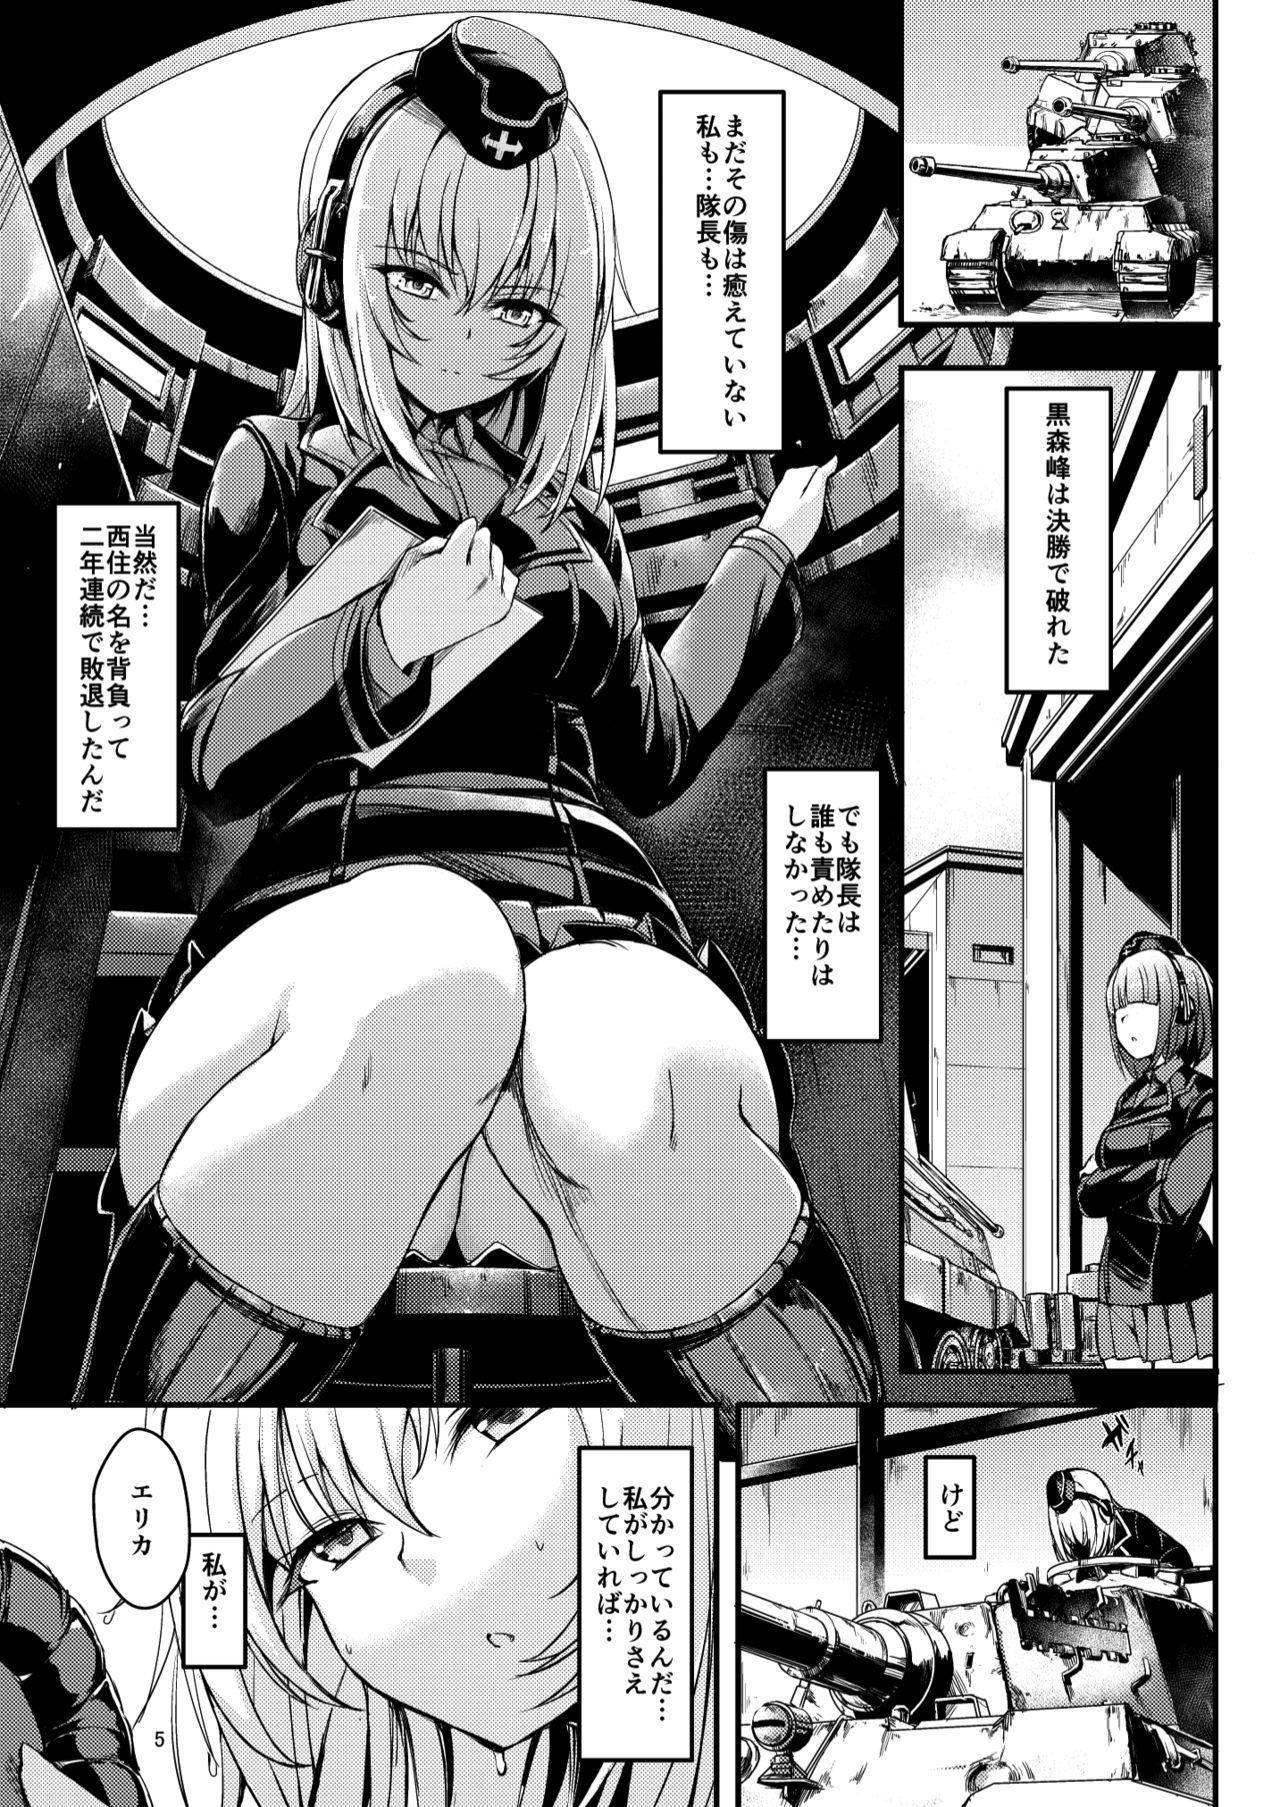 Kuromorimine Ryoujoku 3